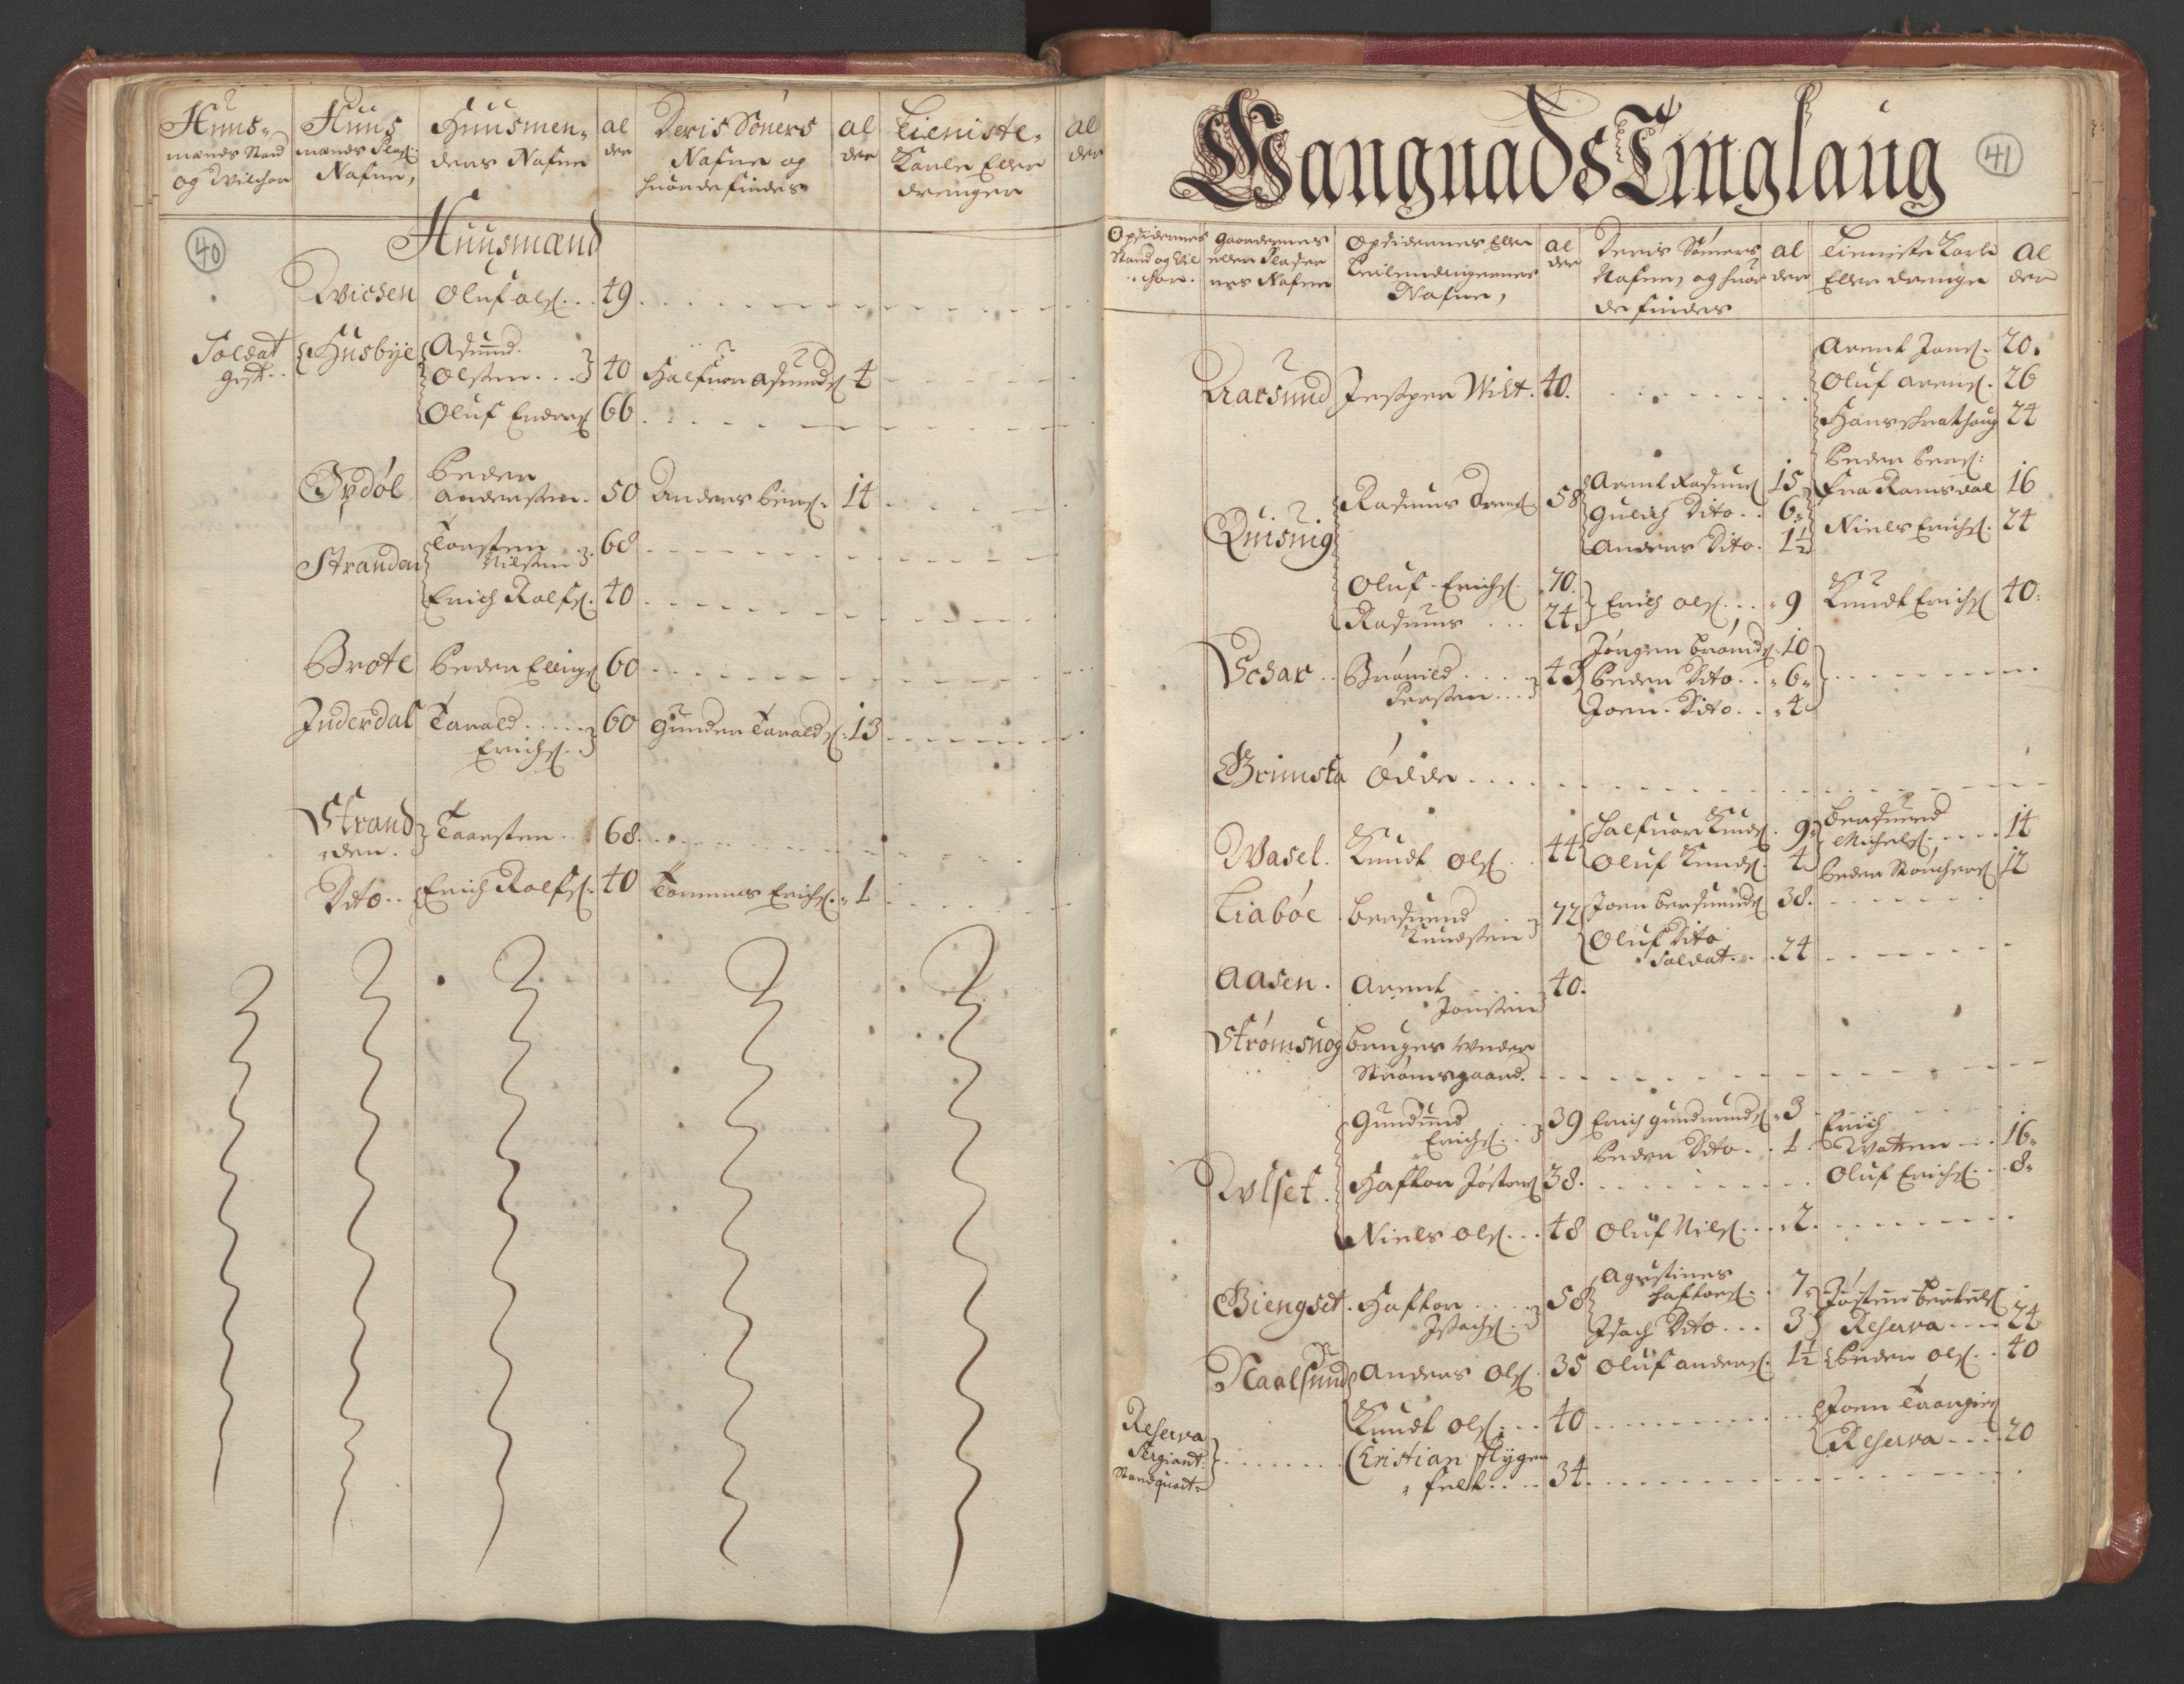 RA, Manntallet 1701, nr. 11: Nordmøre fogderi og Romsdal fogderi, 1701, s. 40-41